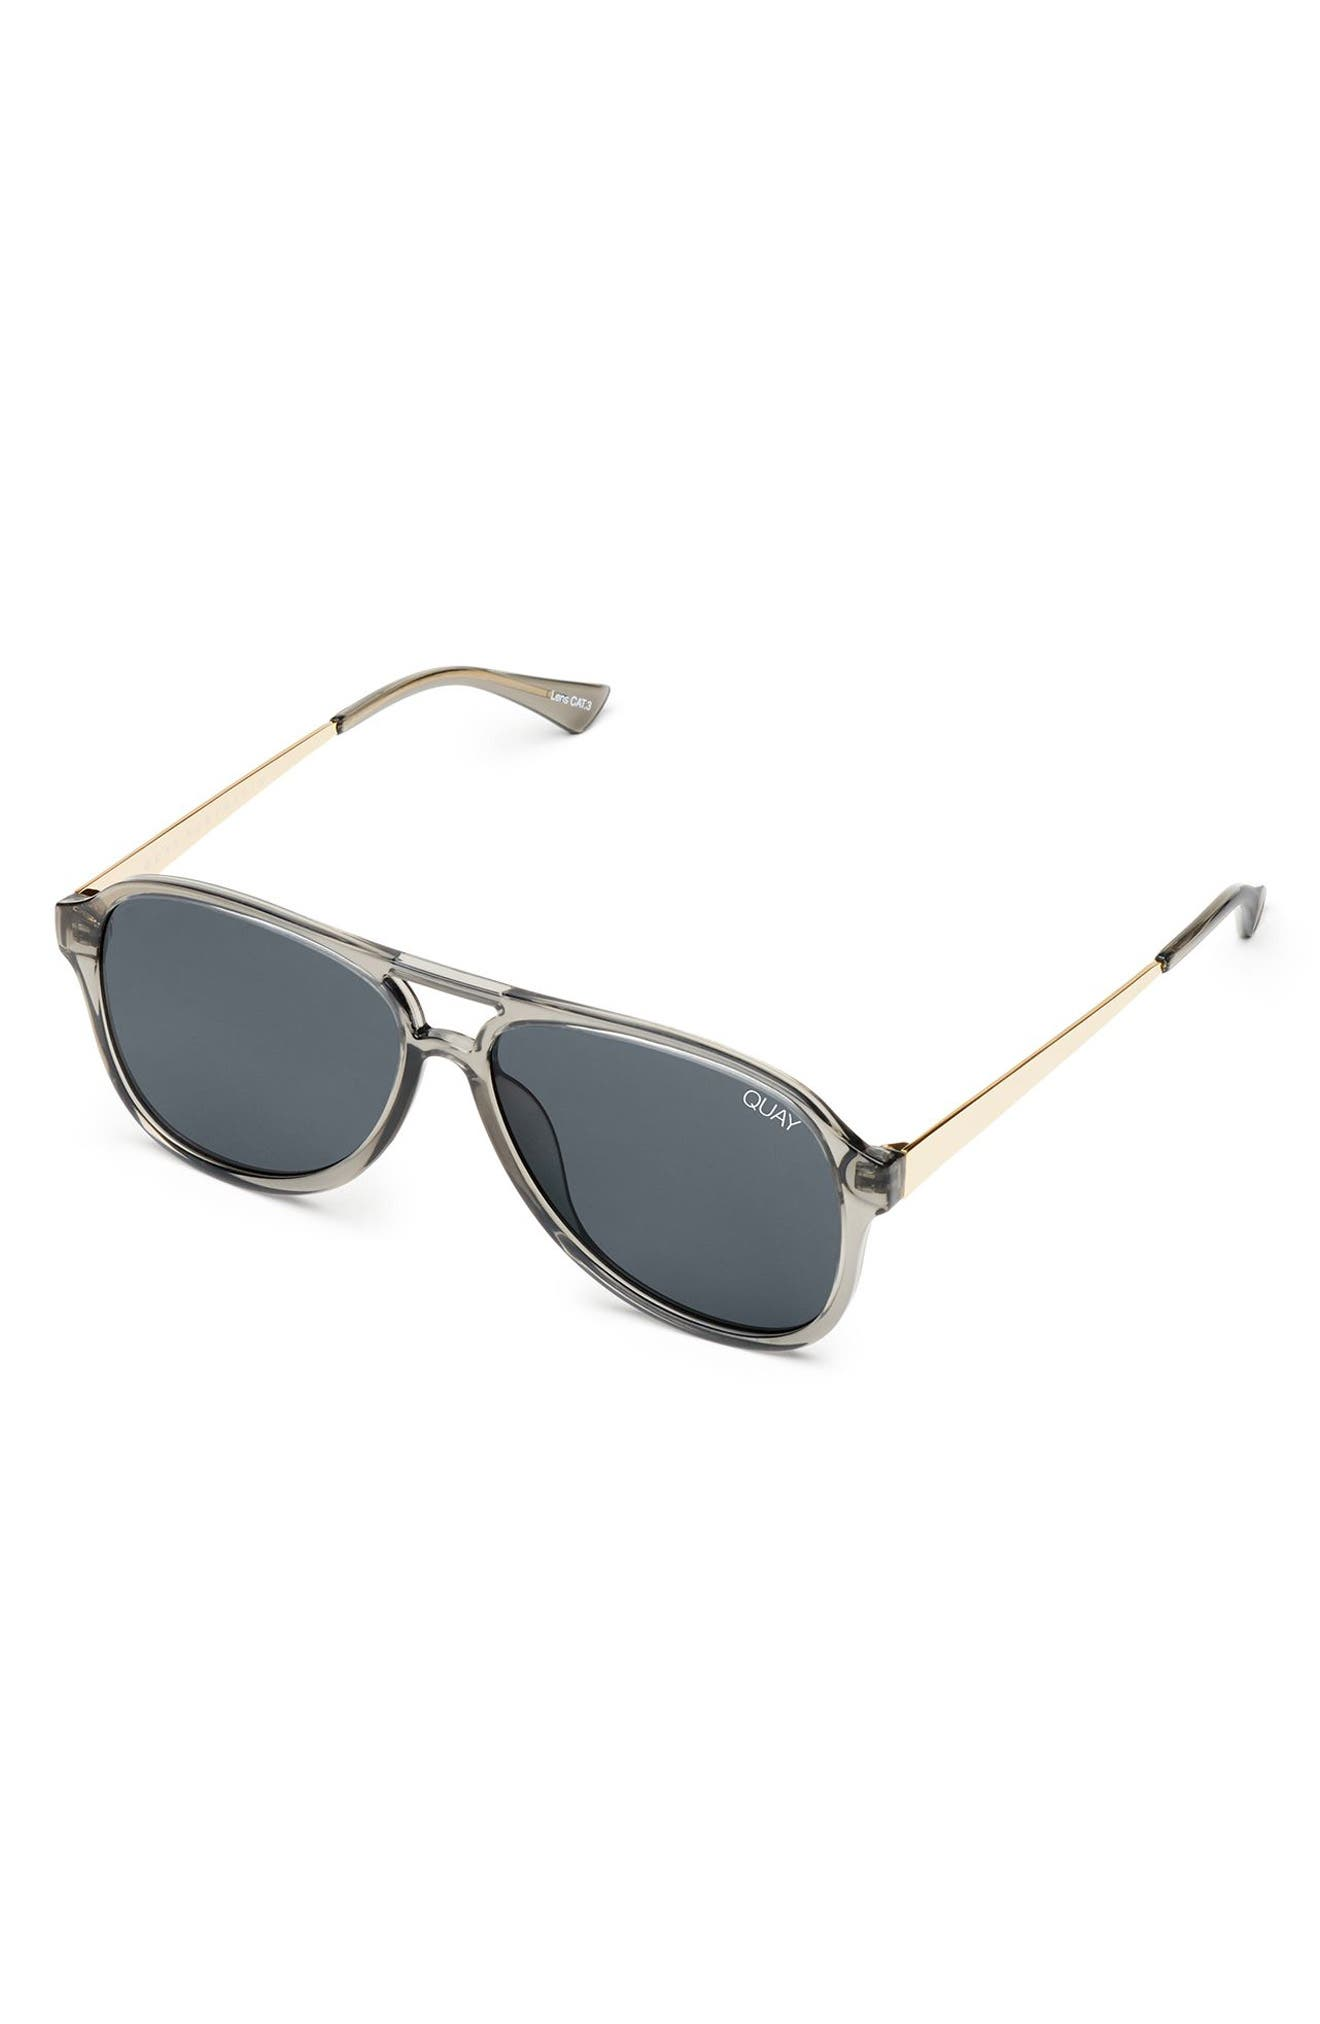 Under Pressure 58mm Aviator Sunglasses,                             Alternate thumbnail 4, color,                             GREY/ SMOKE